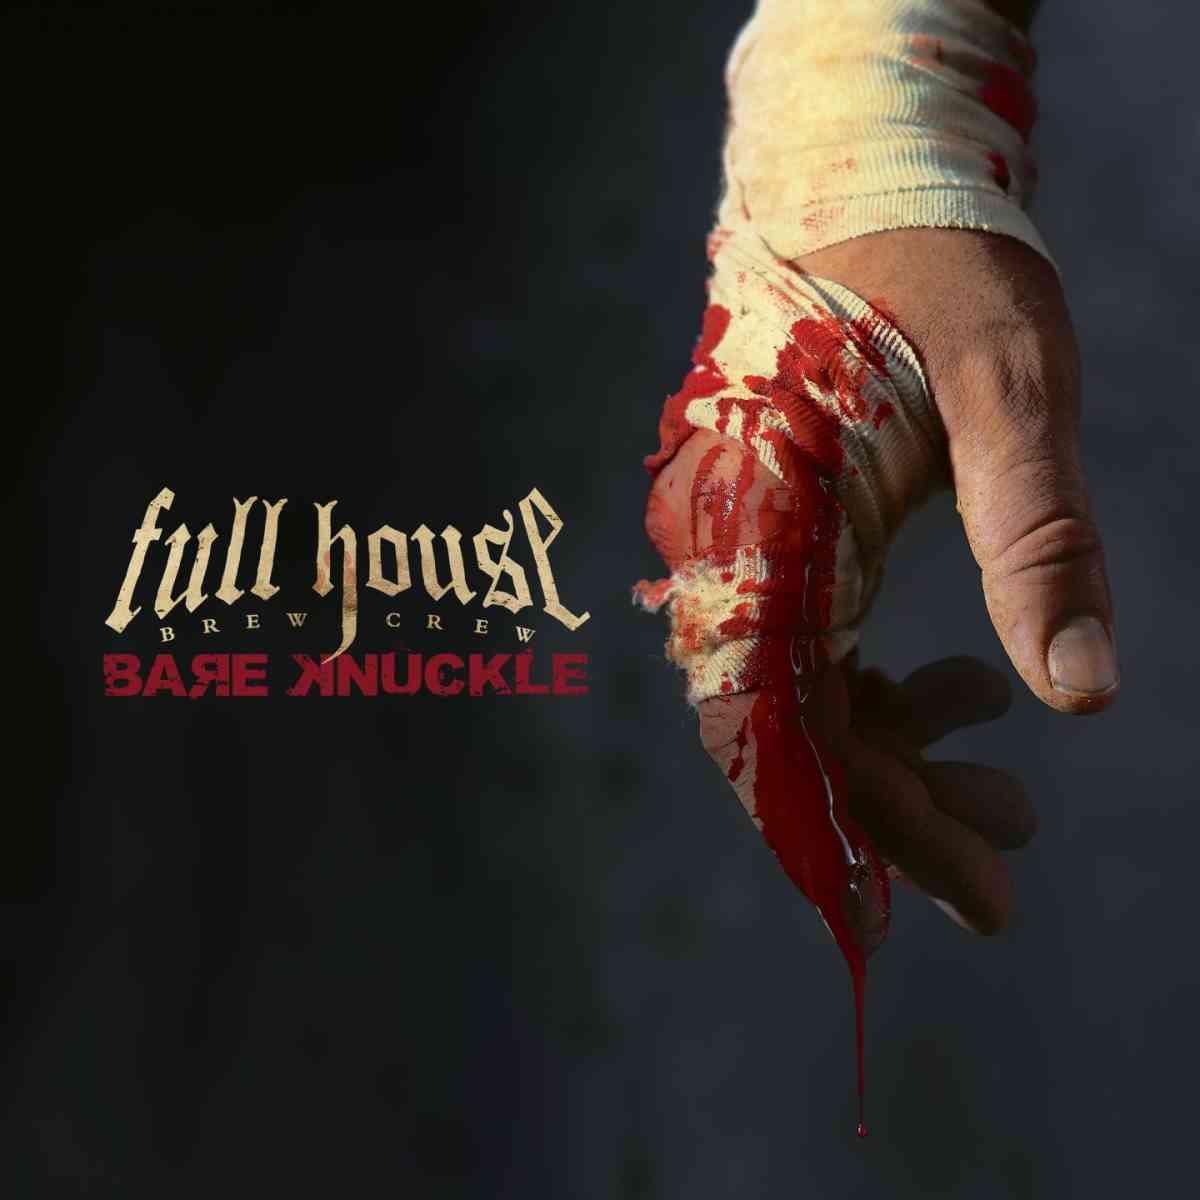 Full House Brew Crew - bare knuckle - album cover